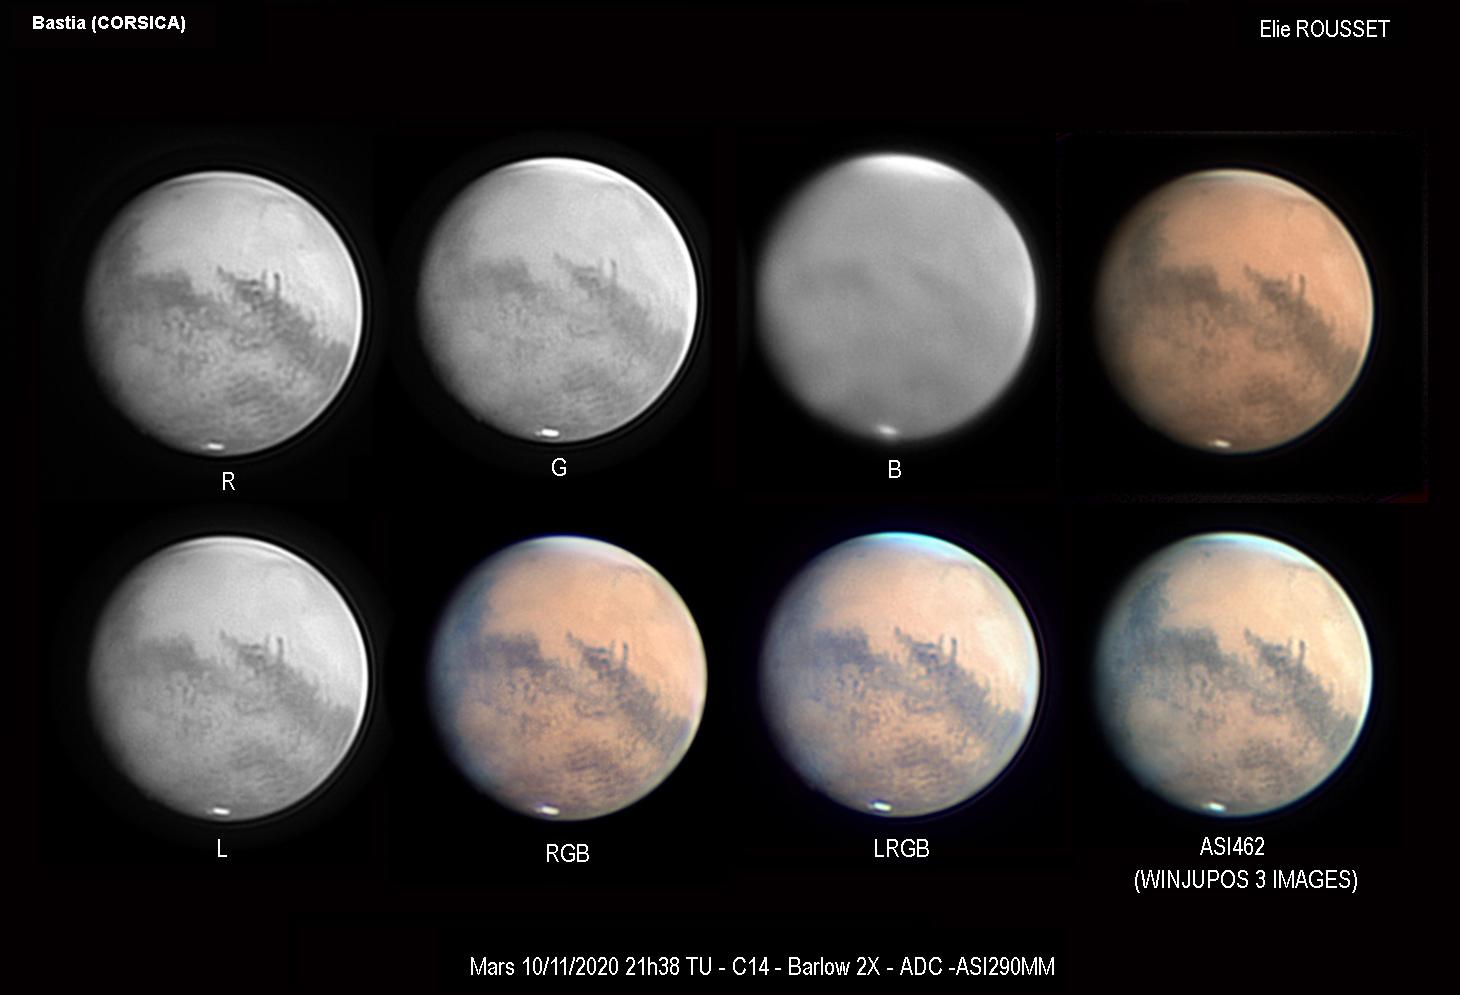 PARS_2020-11-10--21h38-Plan.jpg